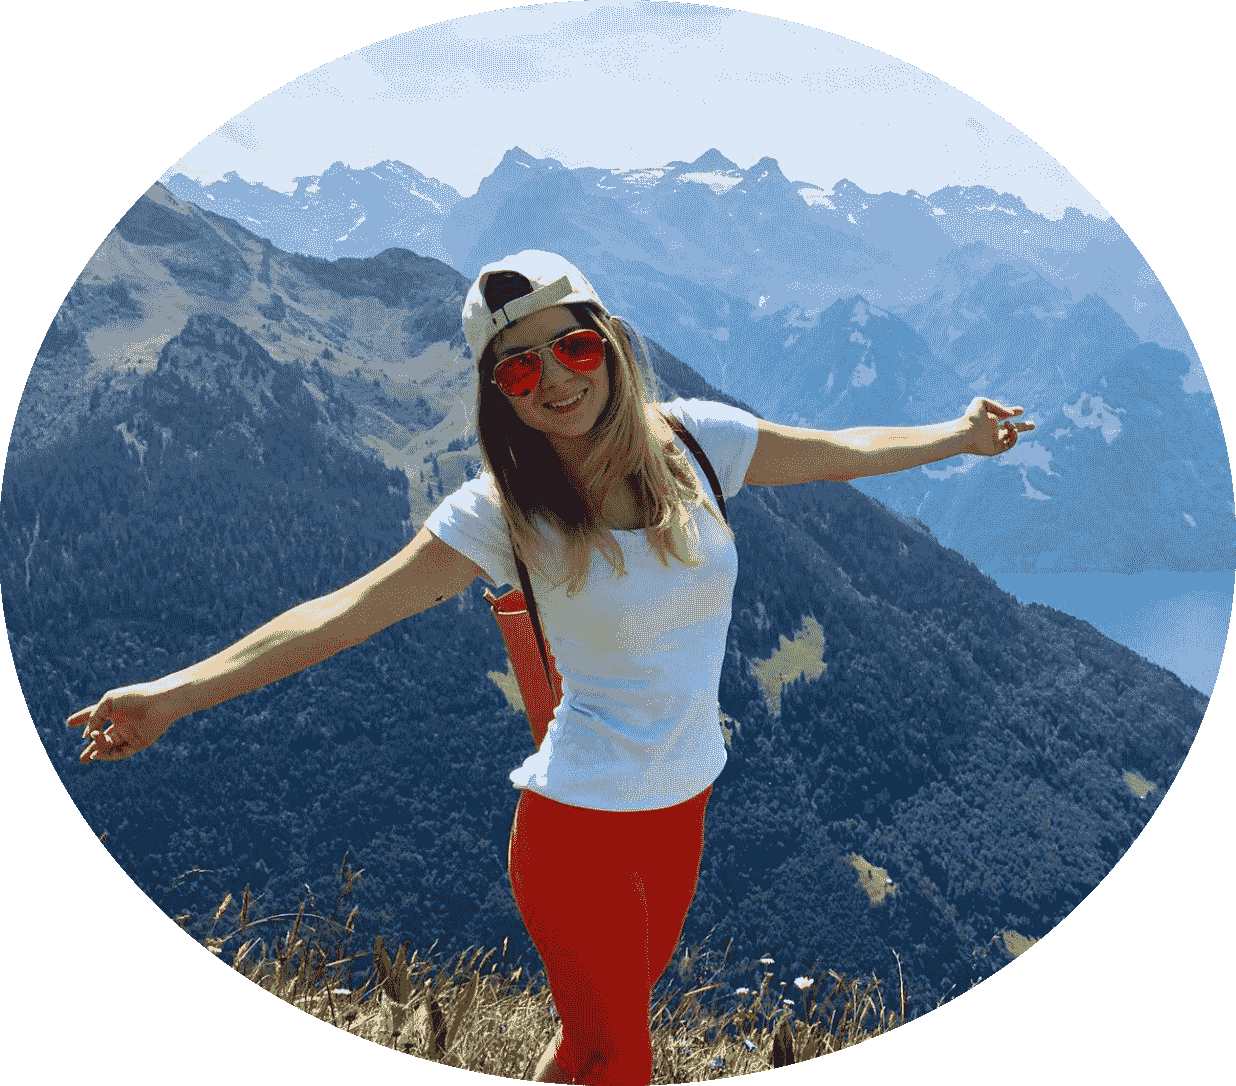 Switzerland Beautiful woman Explore Stoos beginners après-ski ski centre Swiss